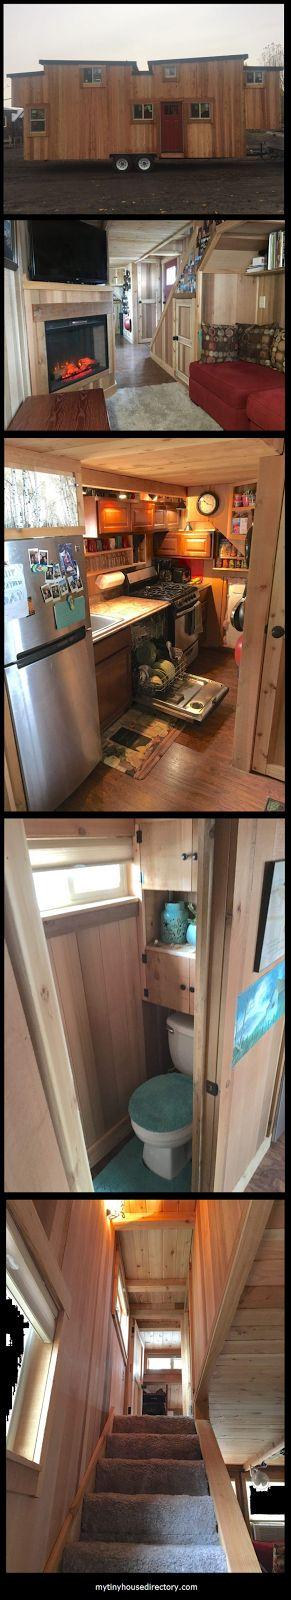 mytinyhousedirectory: 400 sq ft Tiny Home West Linn Oregon